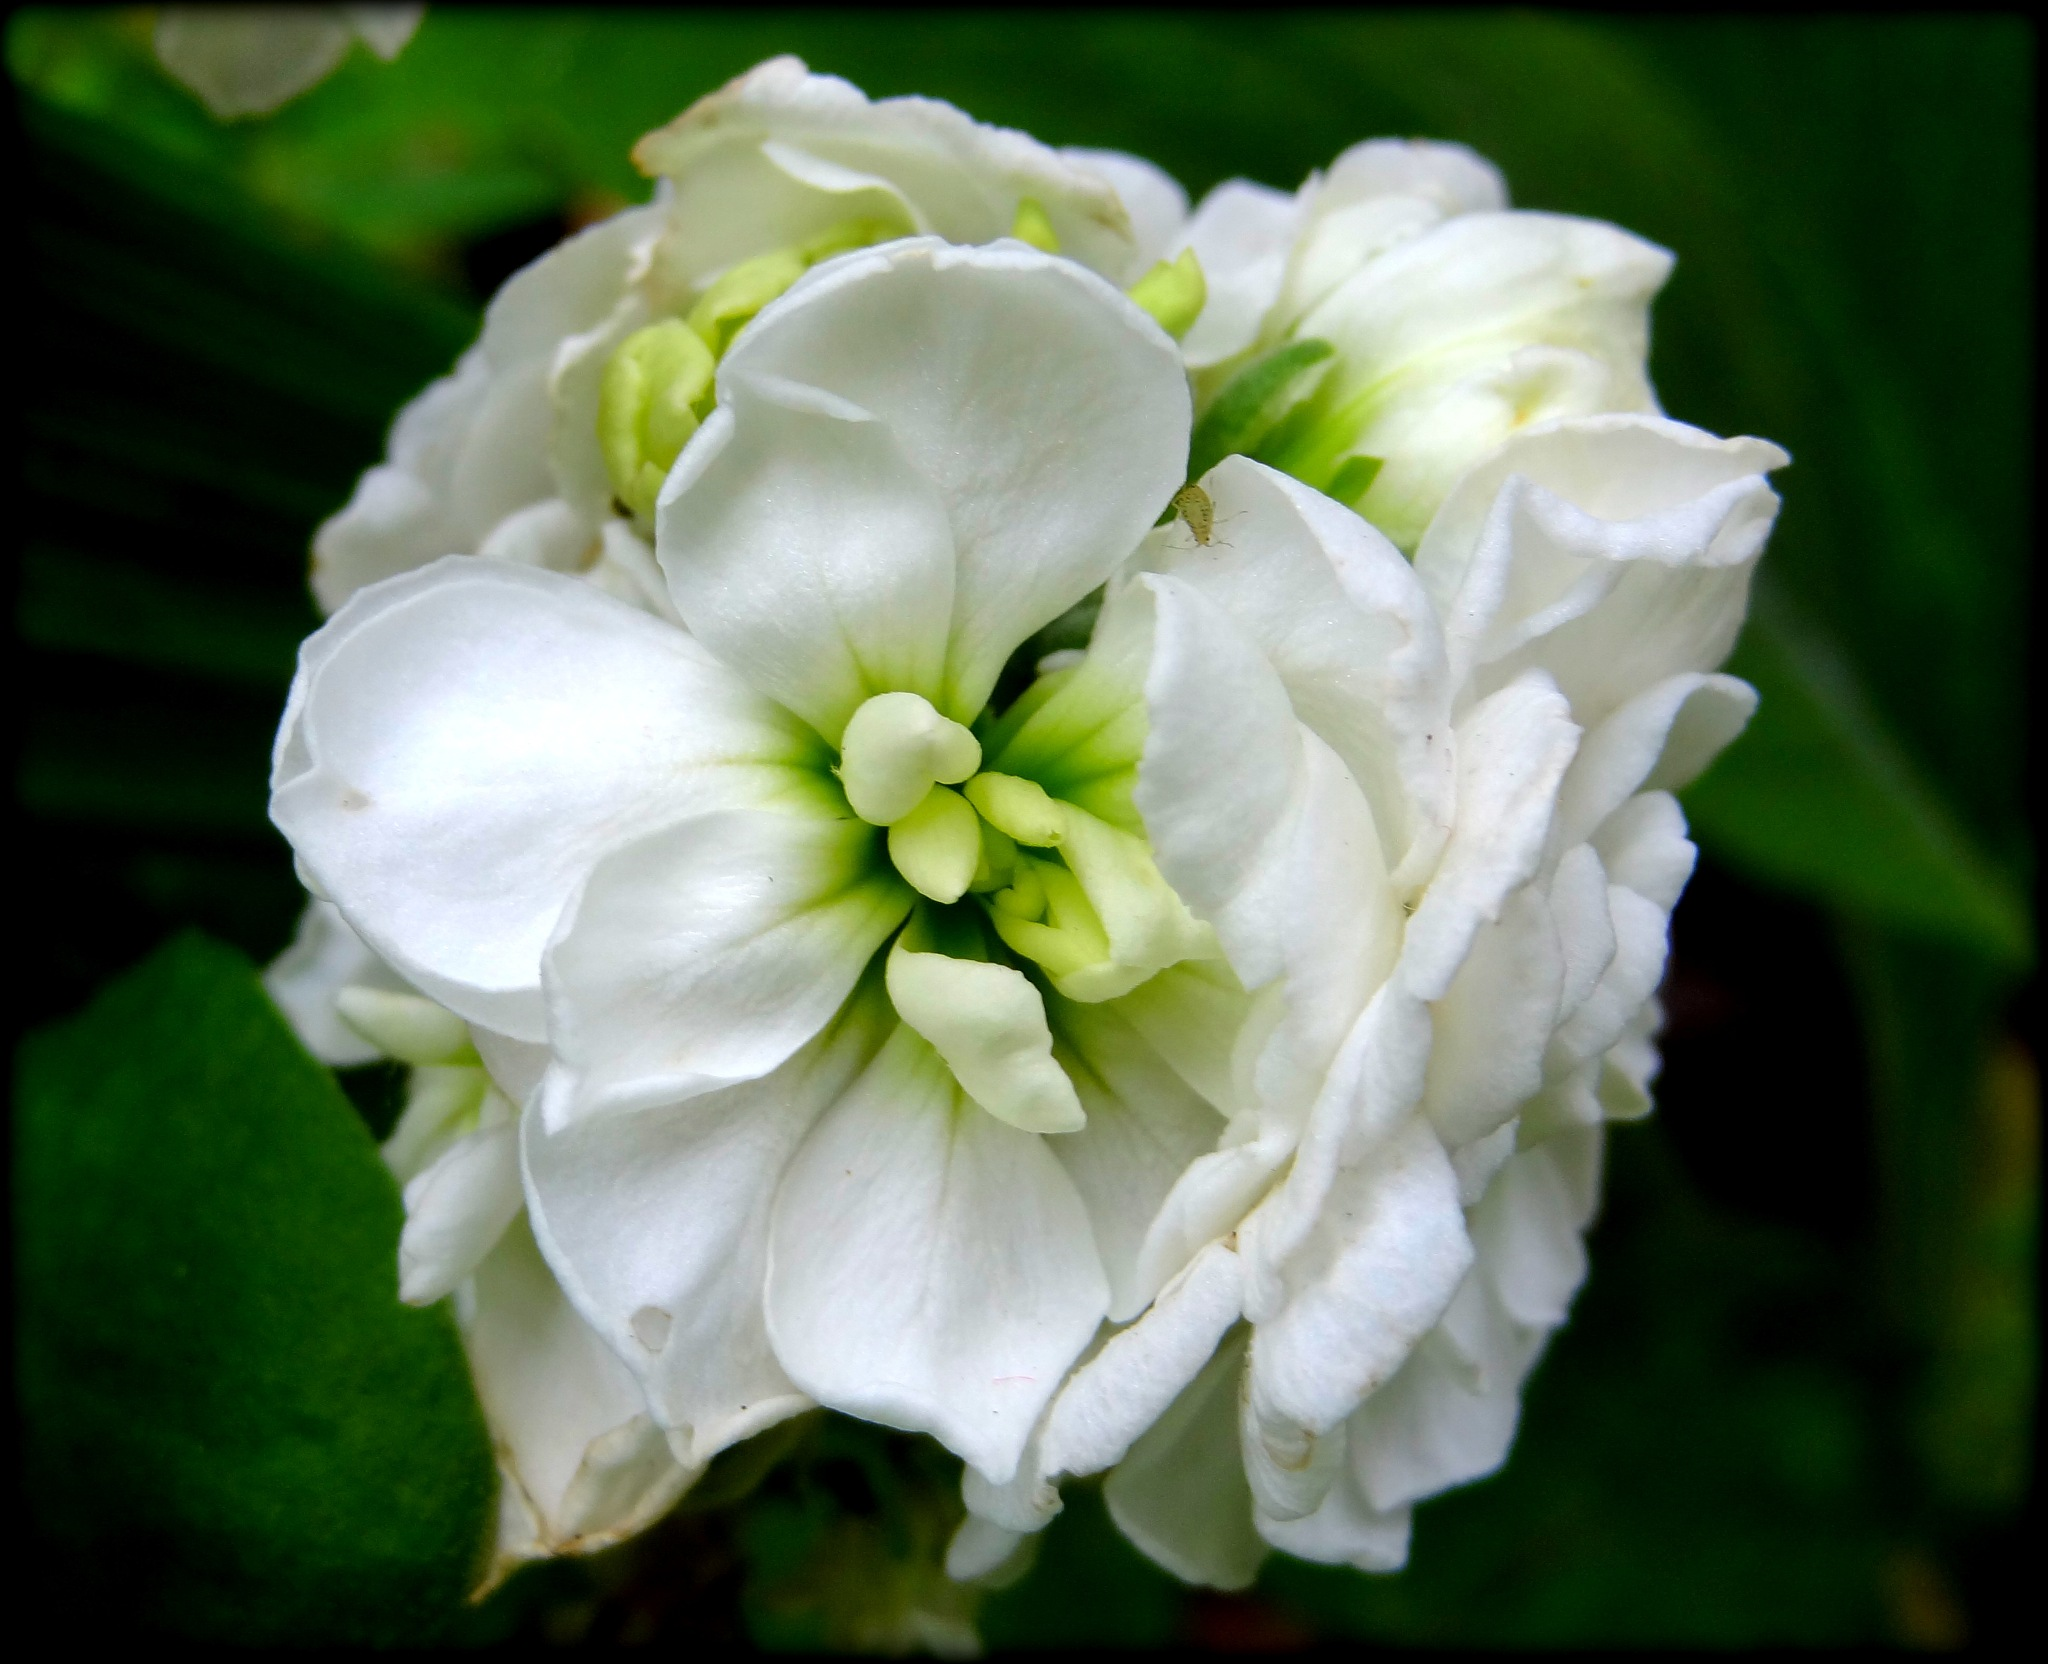 A Stock Flower by jcmunckton